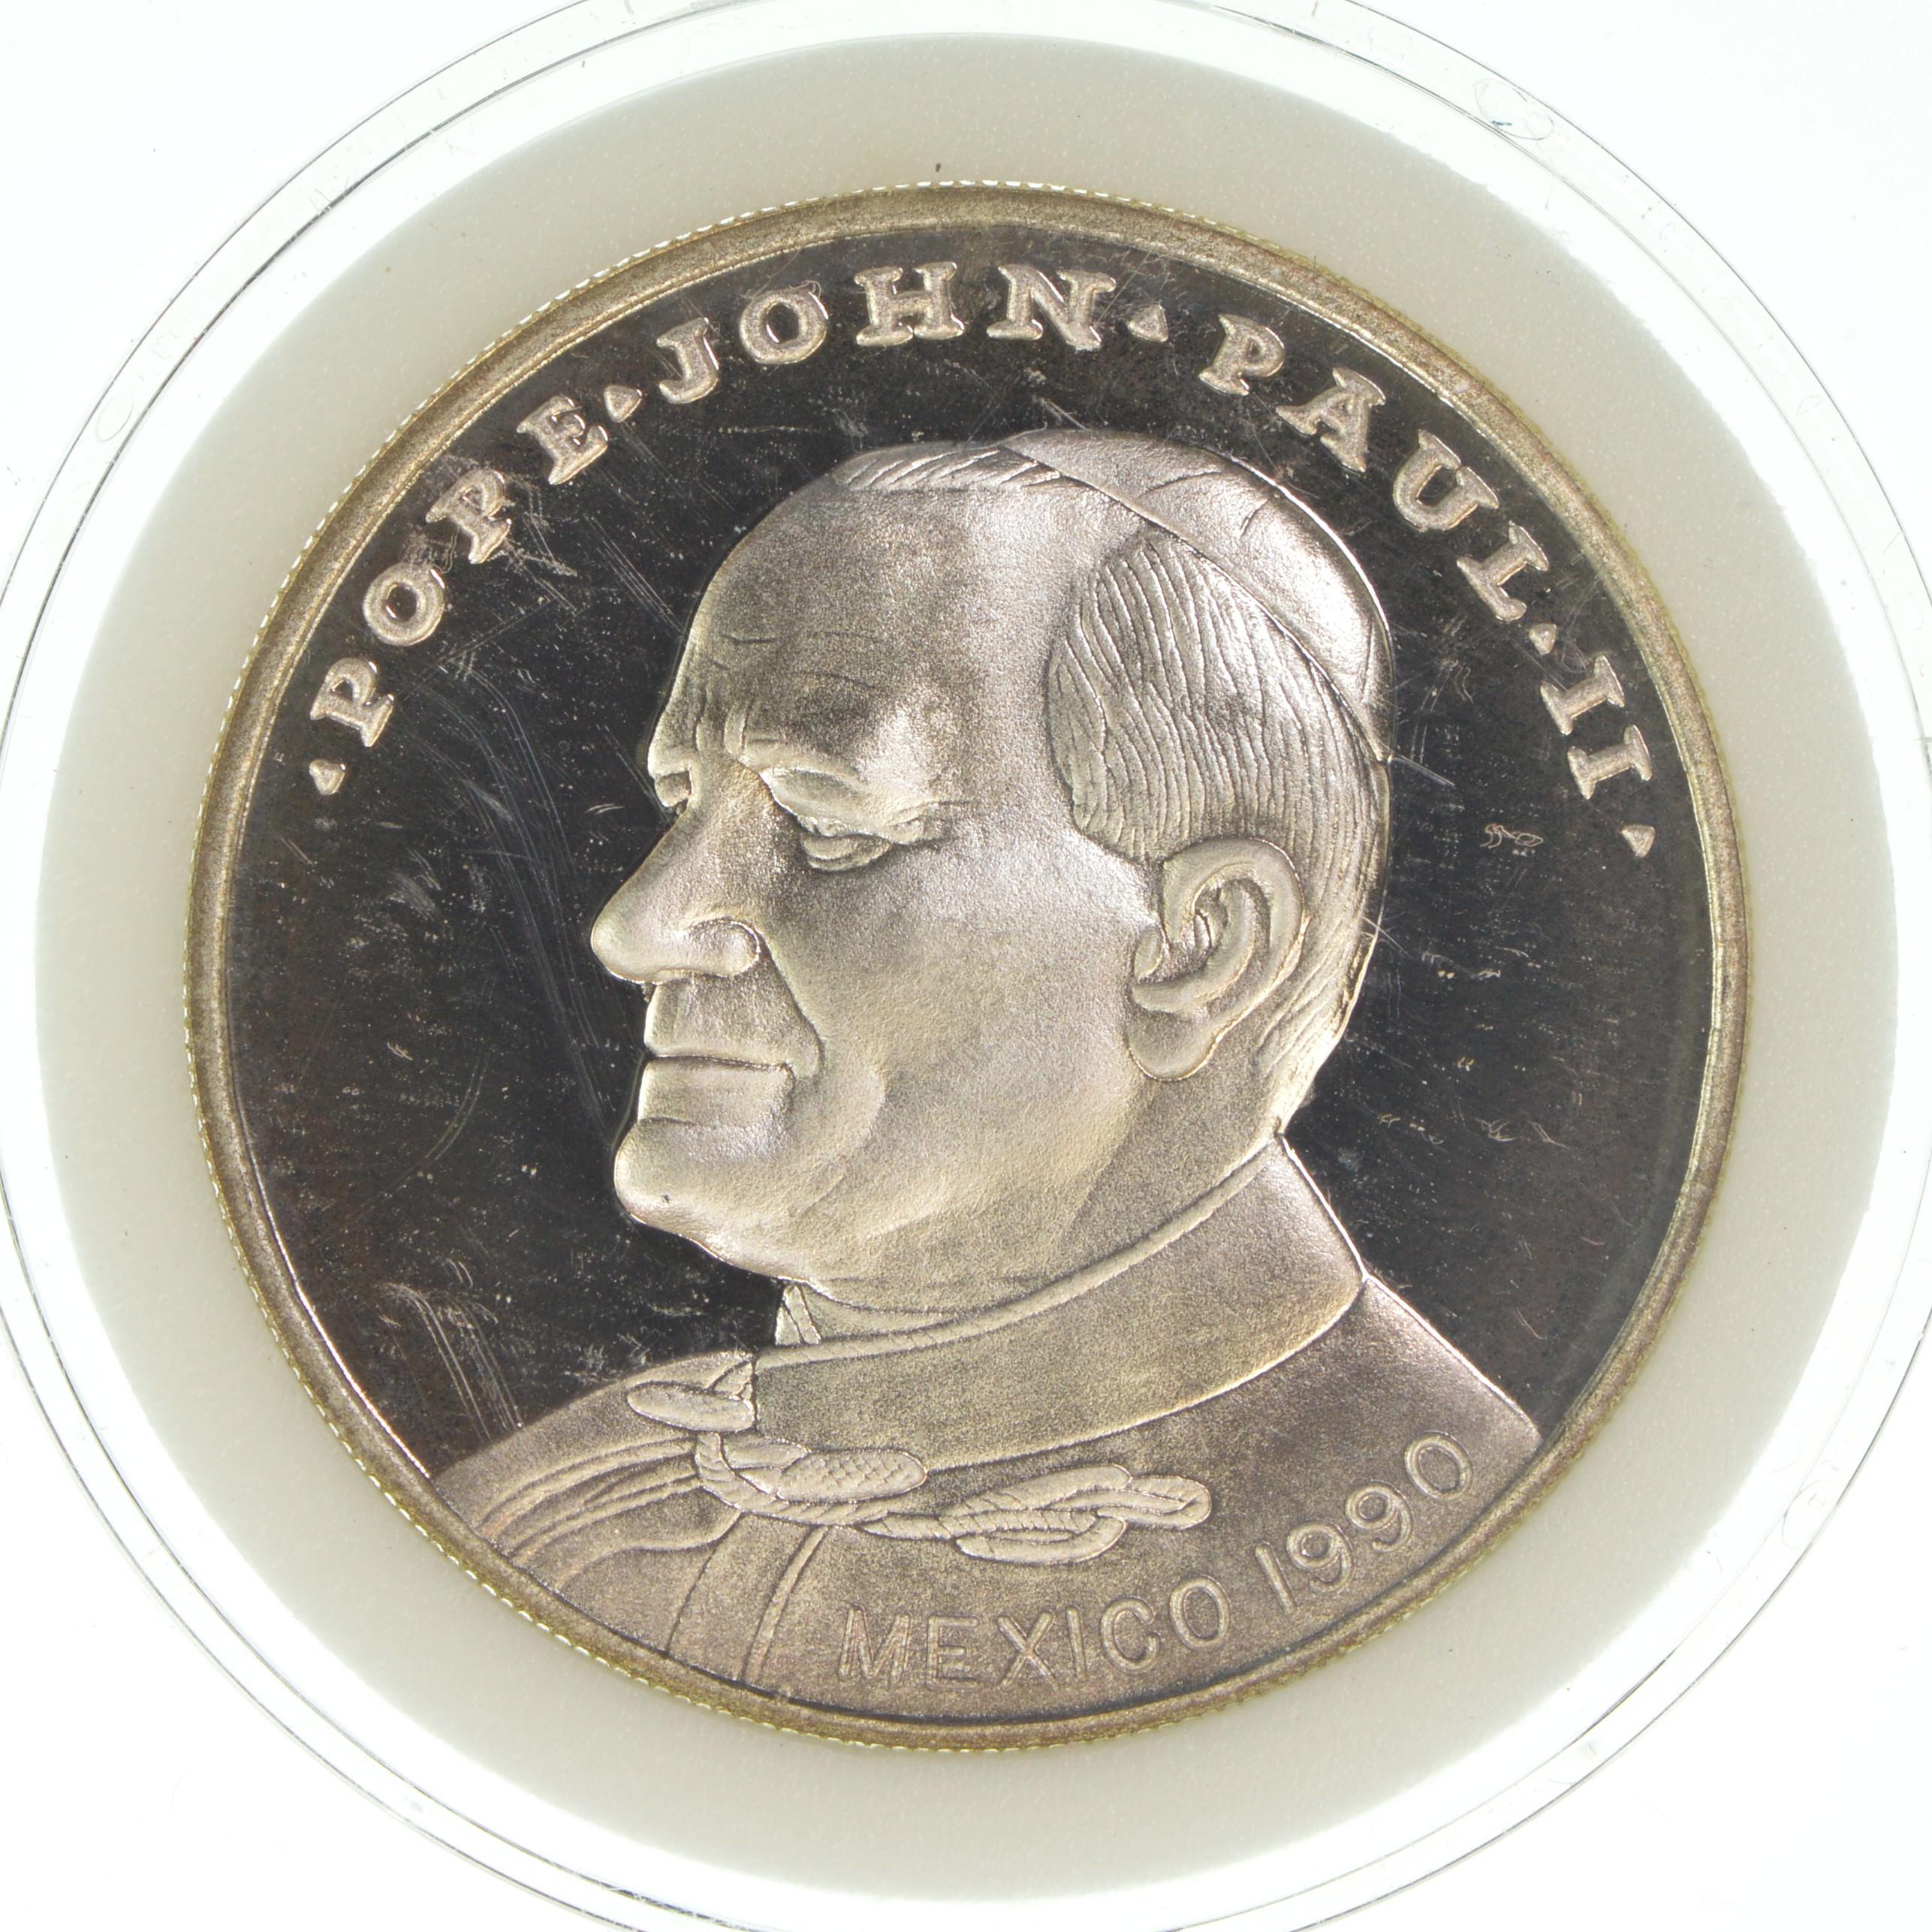 1990 Mexico Pope John Paul Ii 20 00 Face Value  Fine Silver